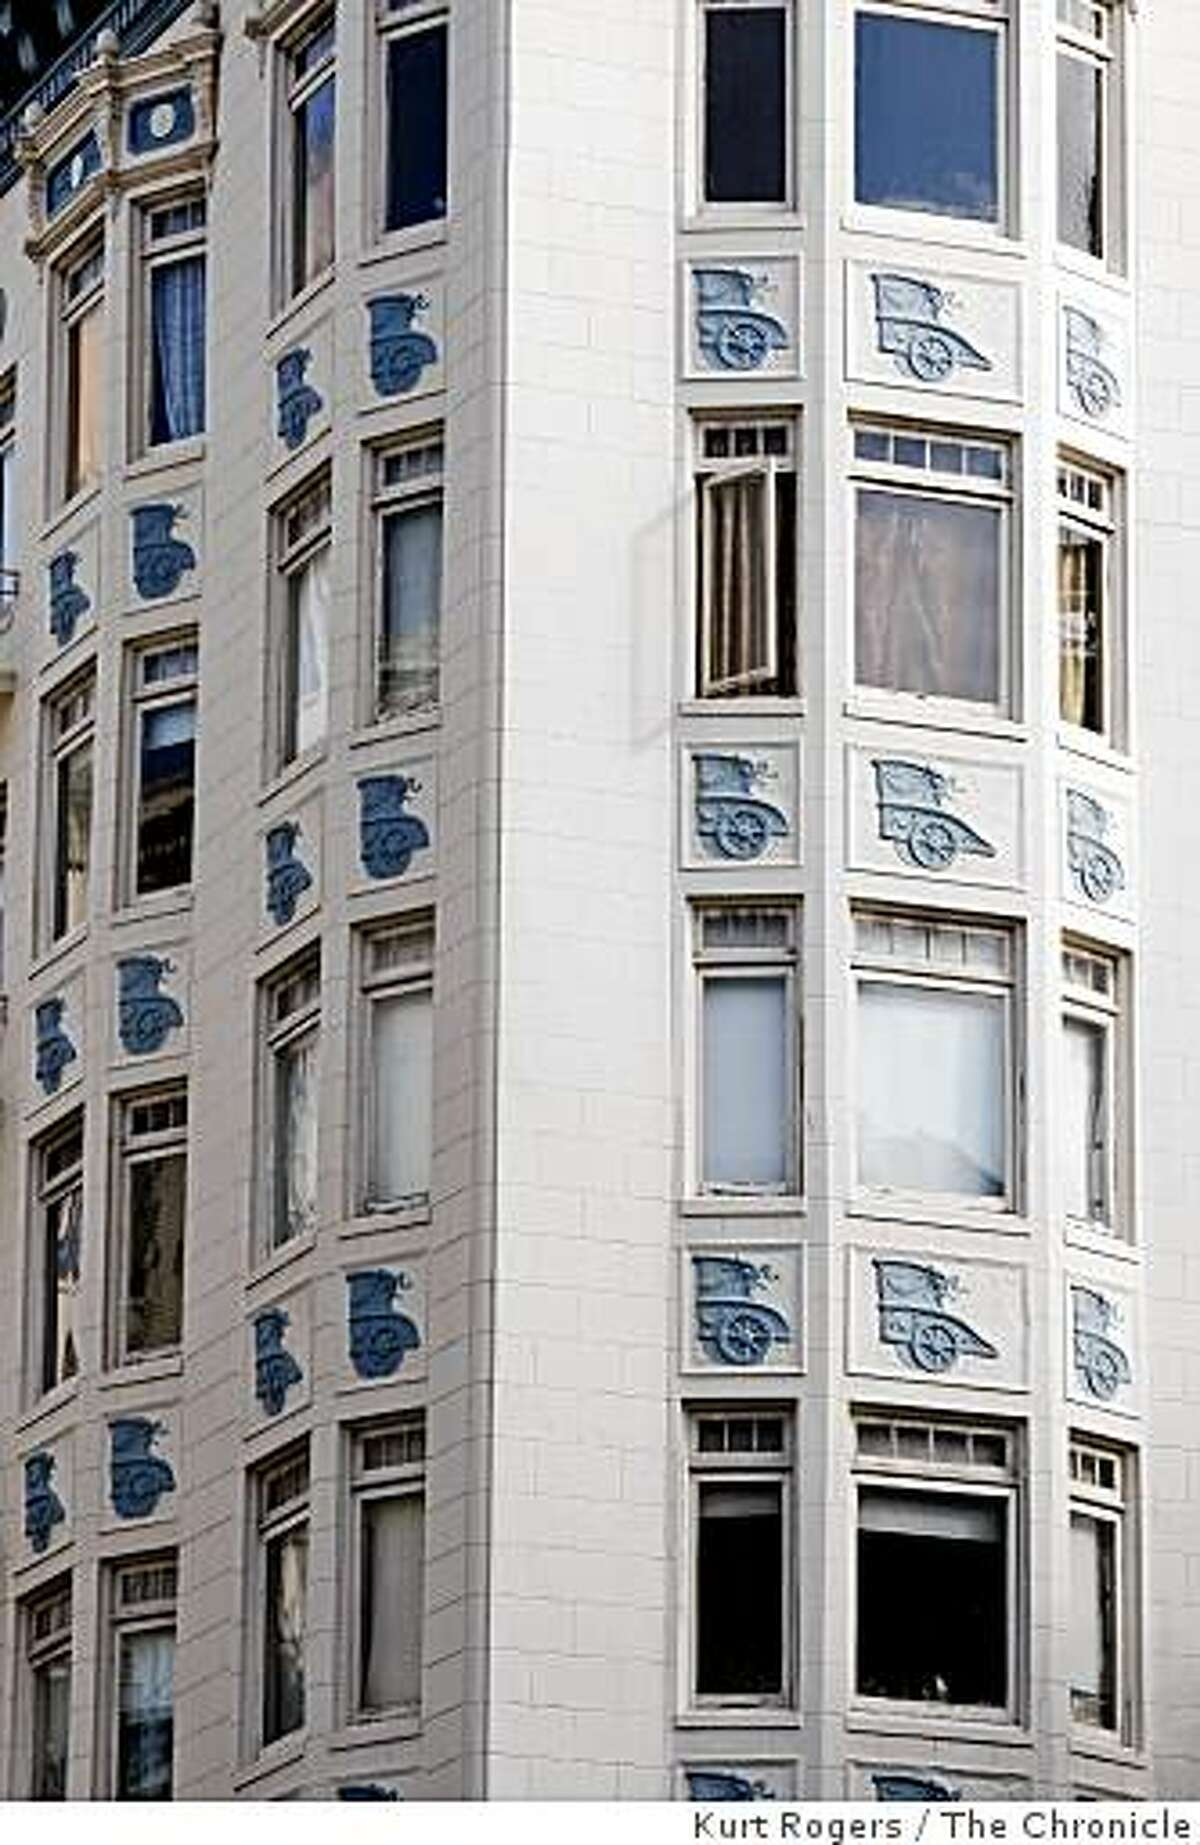 Historic Richness of the Tenderloin. 400 Hyde Ben Hur apartments on Friday Mar 13, 2009 in San Francisco , Calif